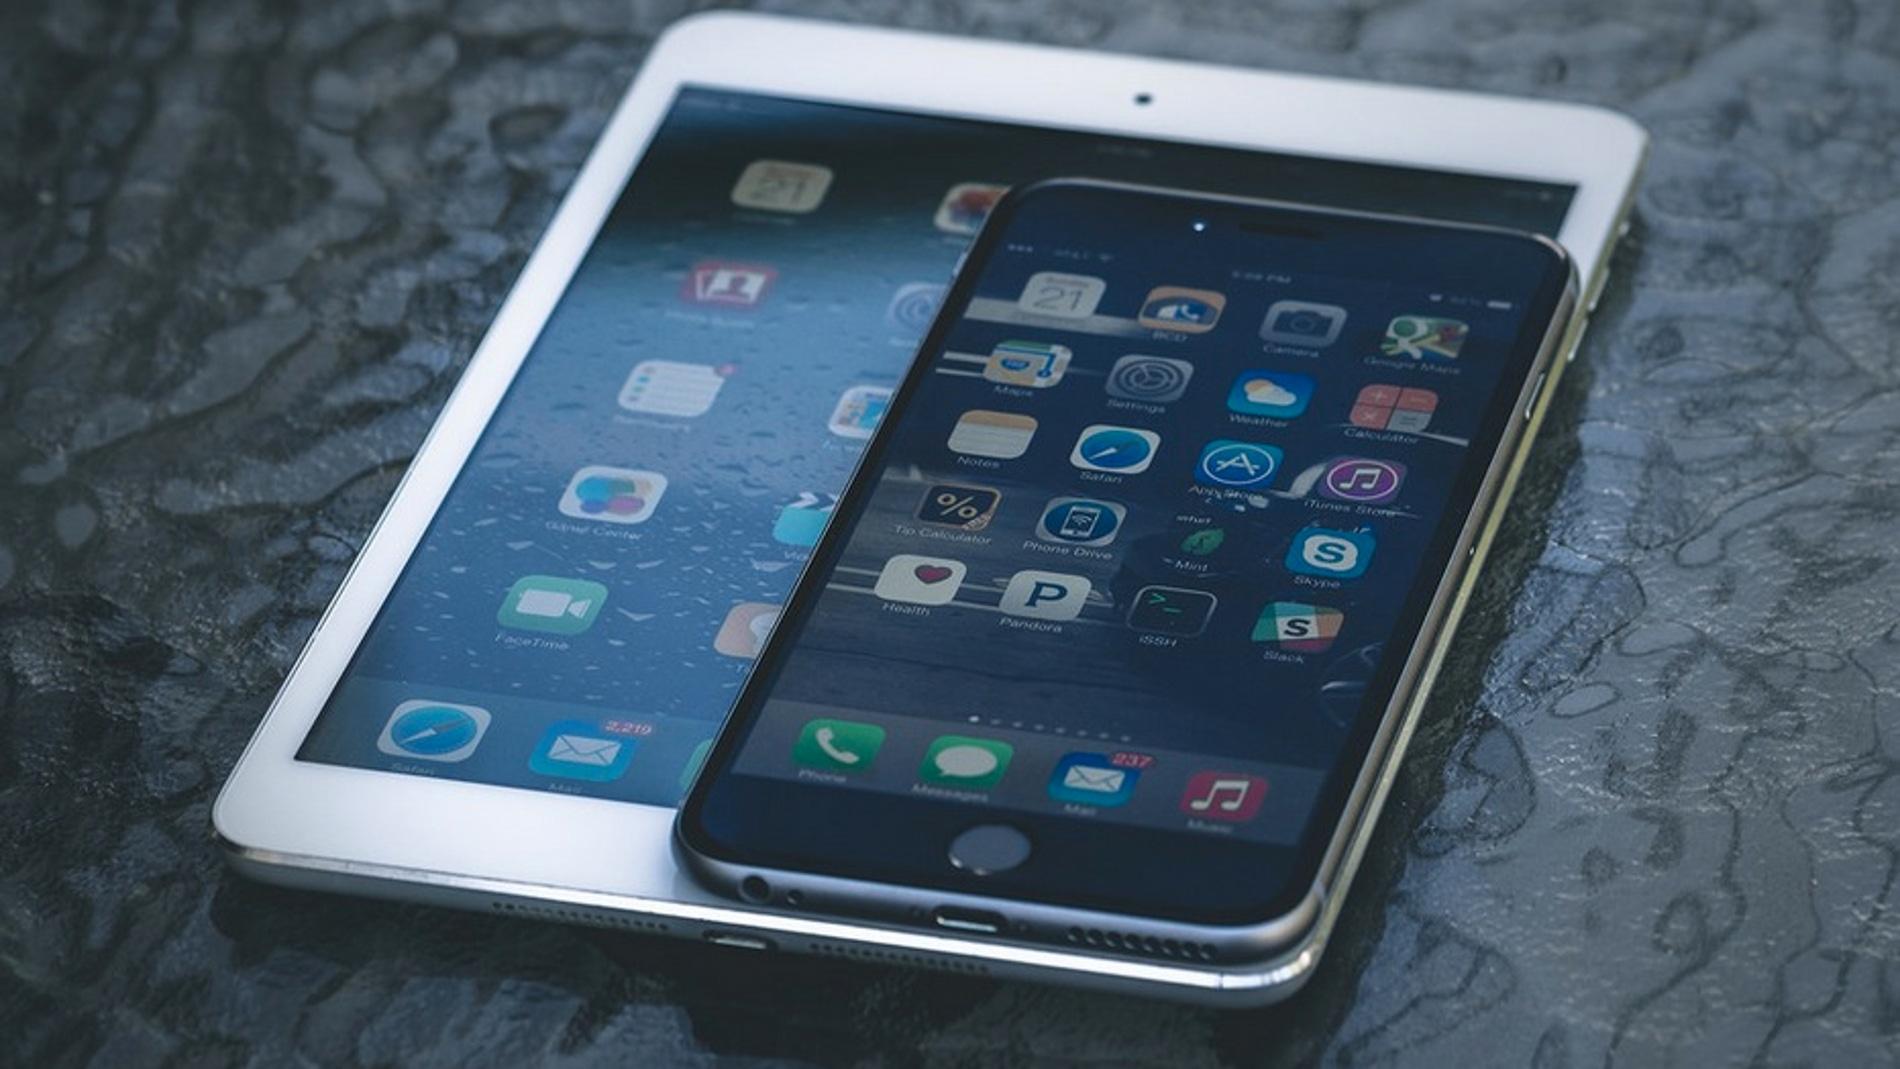 Un iPad Mini junto a un iPhone 6 Plus